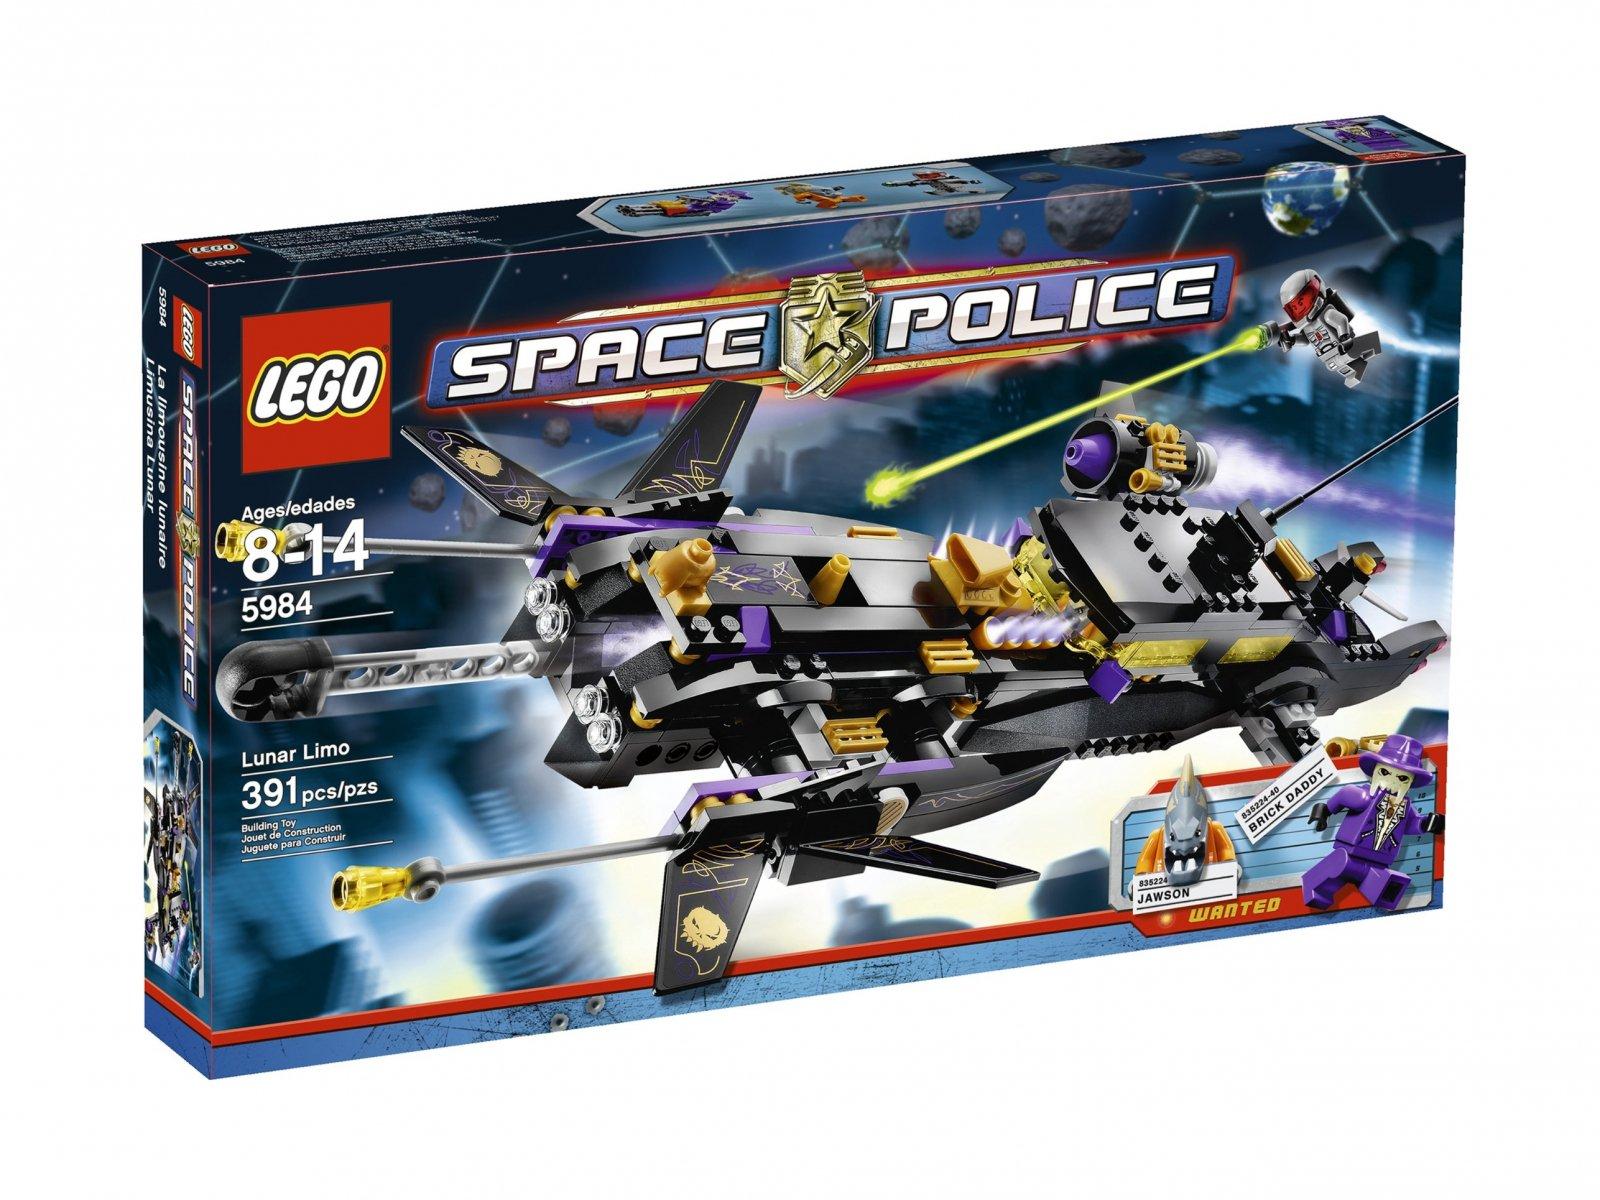 LEGO 5984 Space Police Lunar Limo